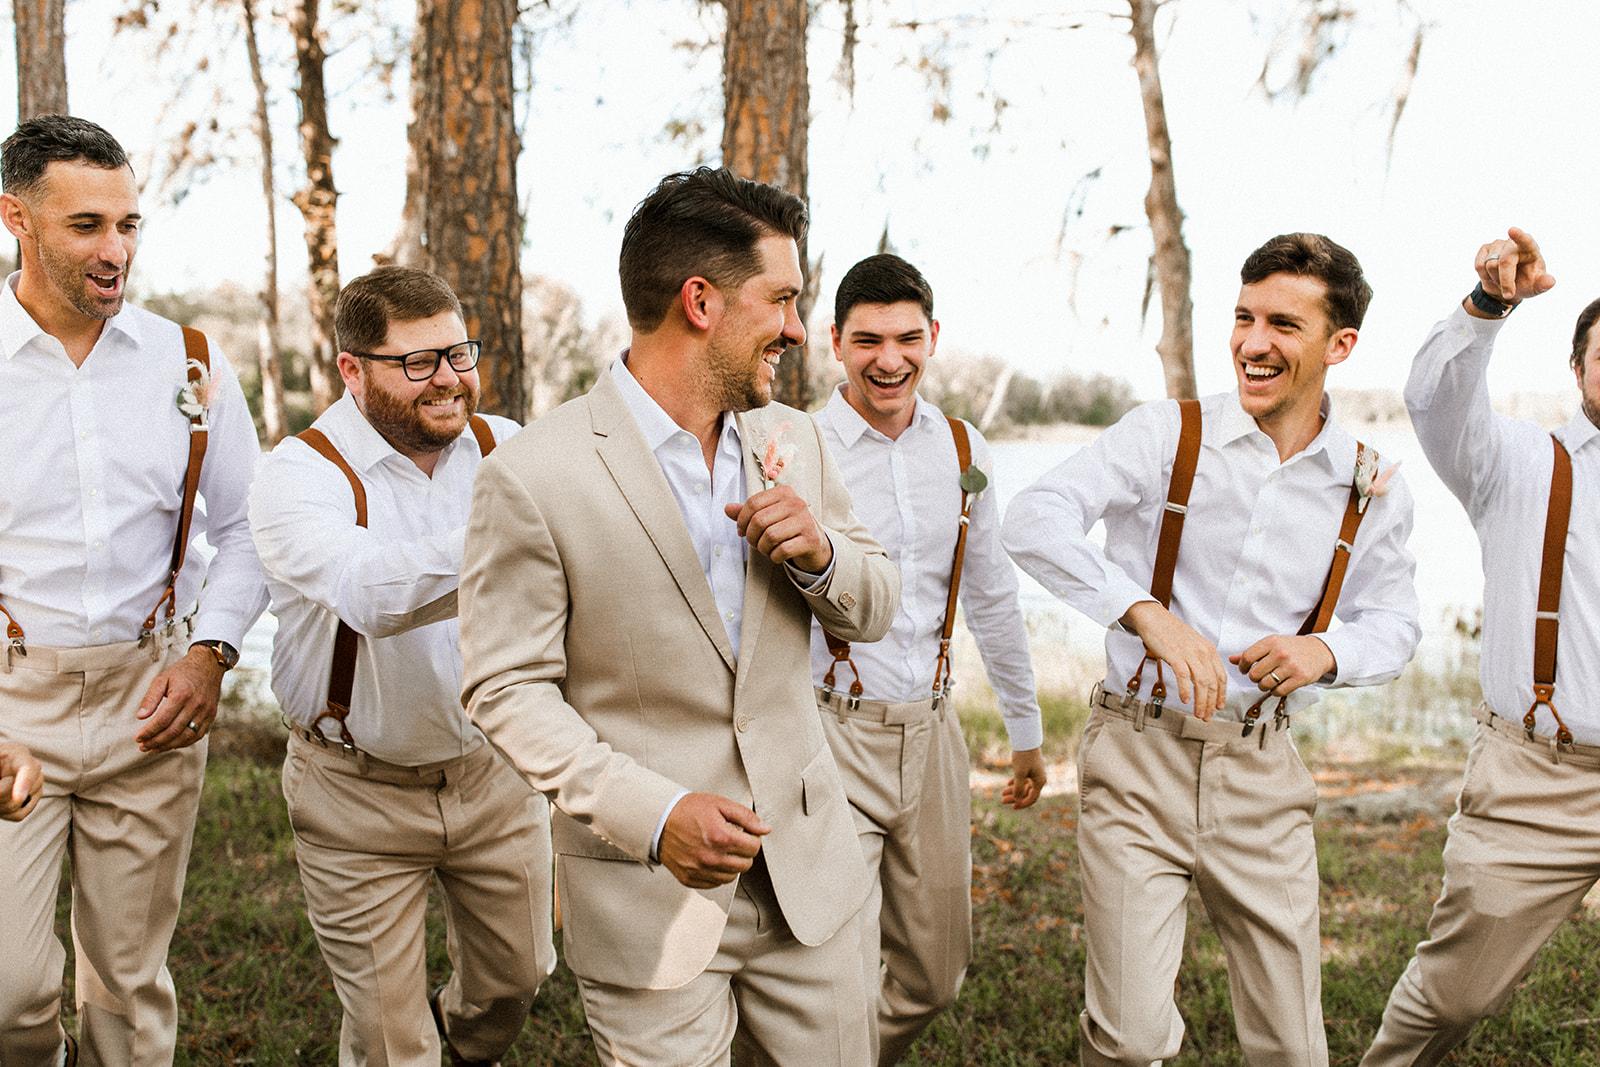 Groom and Groomsmen at Lakeside Wedding Wearing Casual Tan Suits